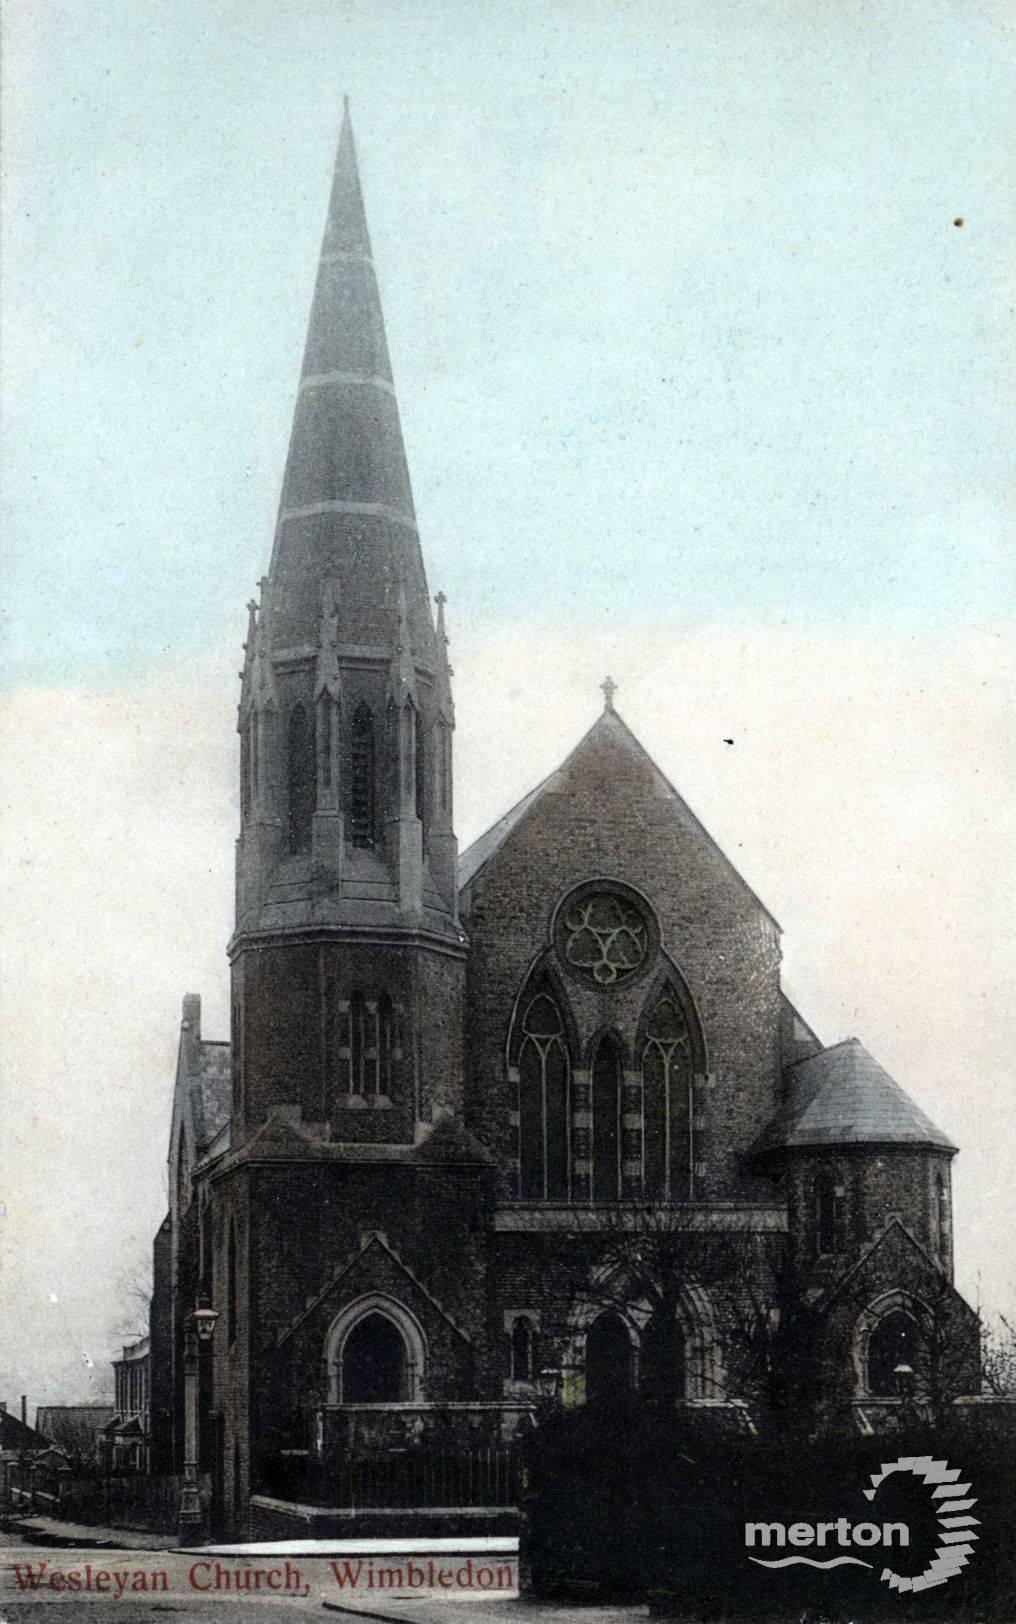 Wesleyan Church Worple Road Wimbledon Merton Memories